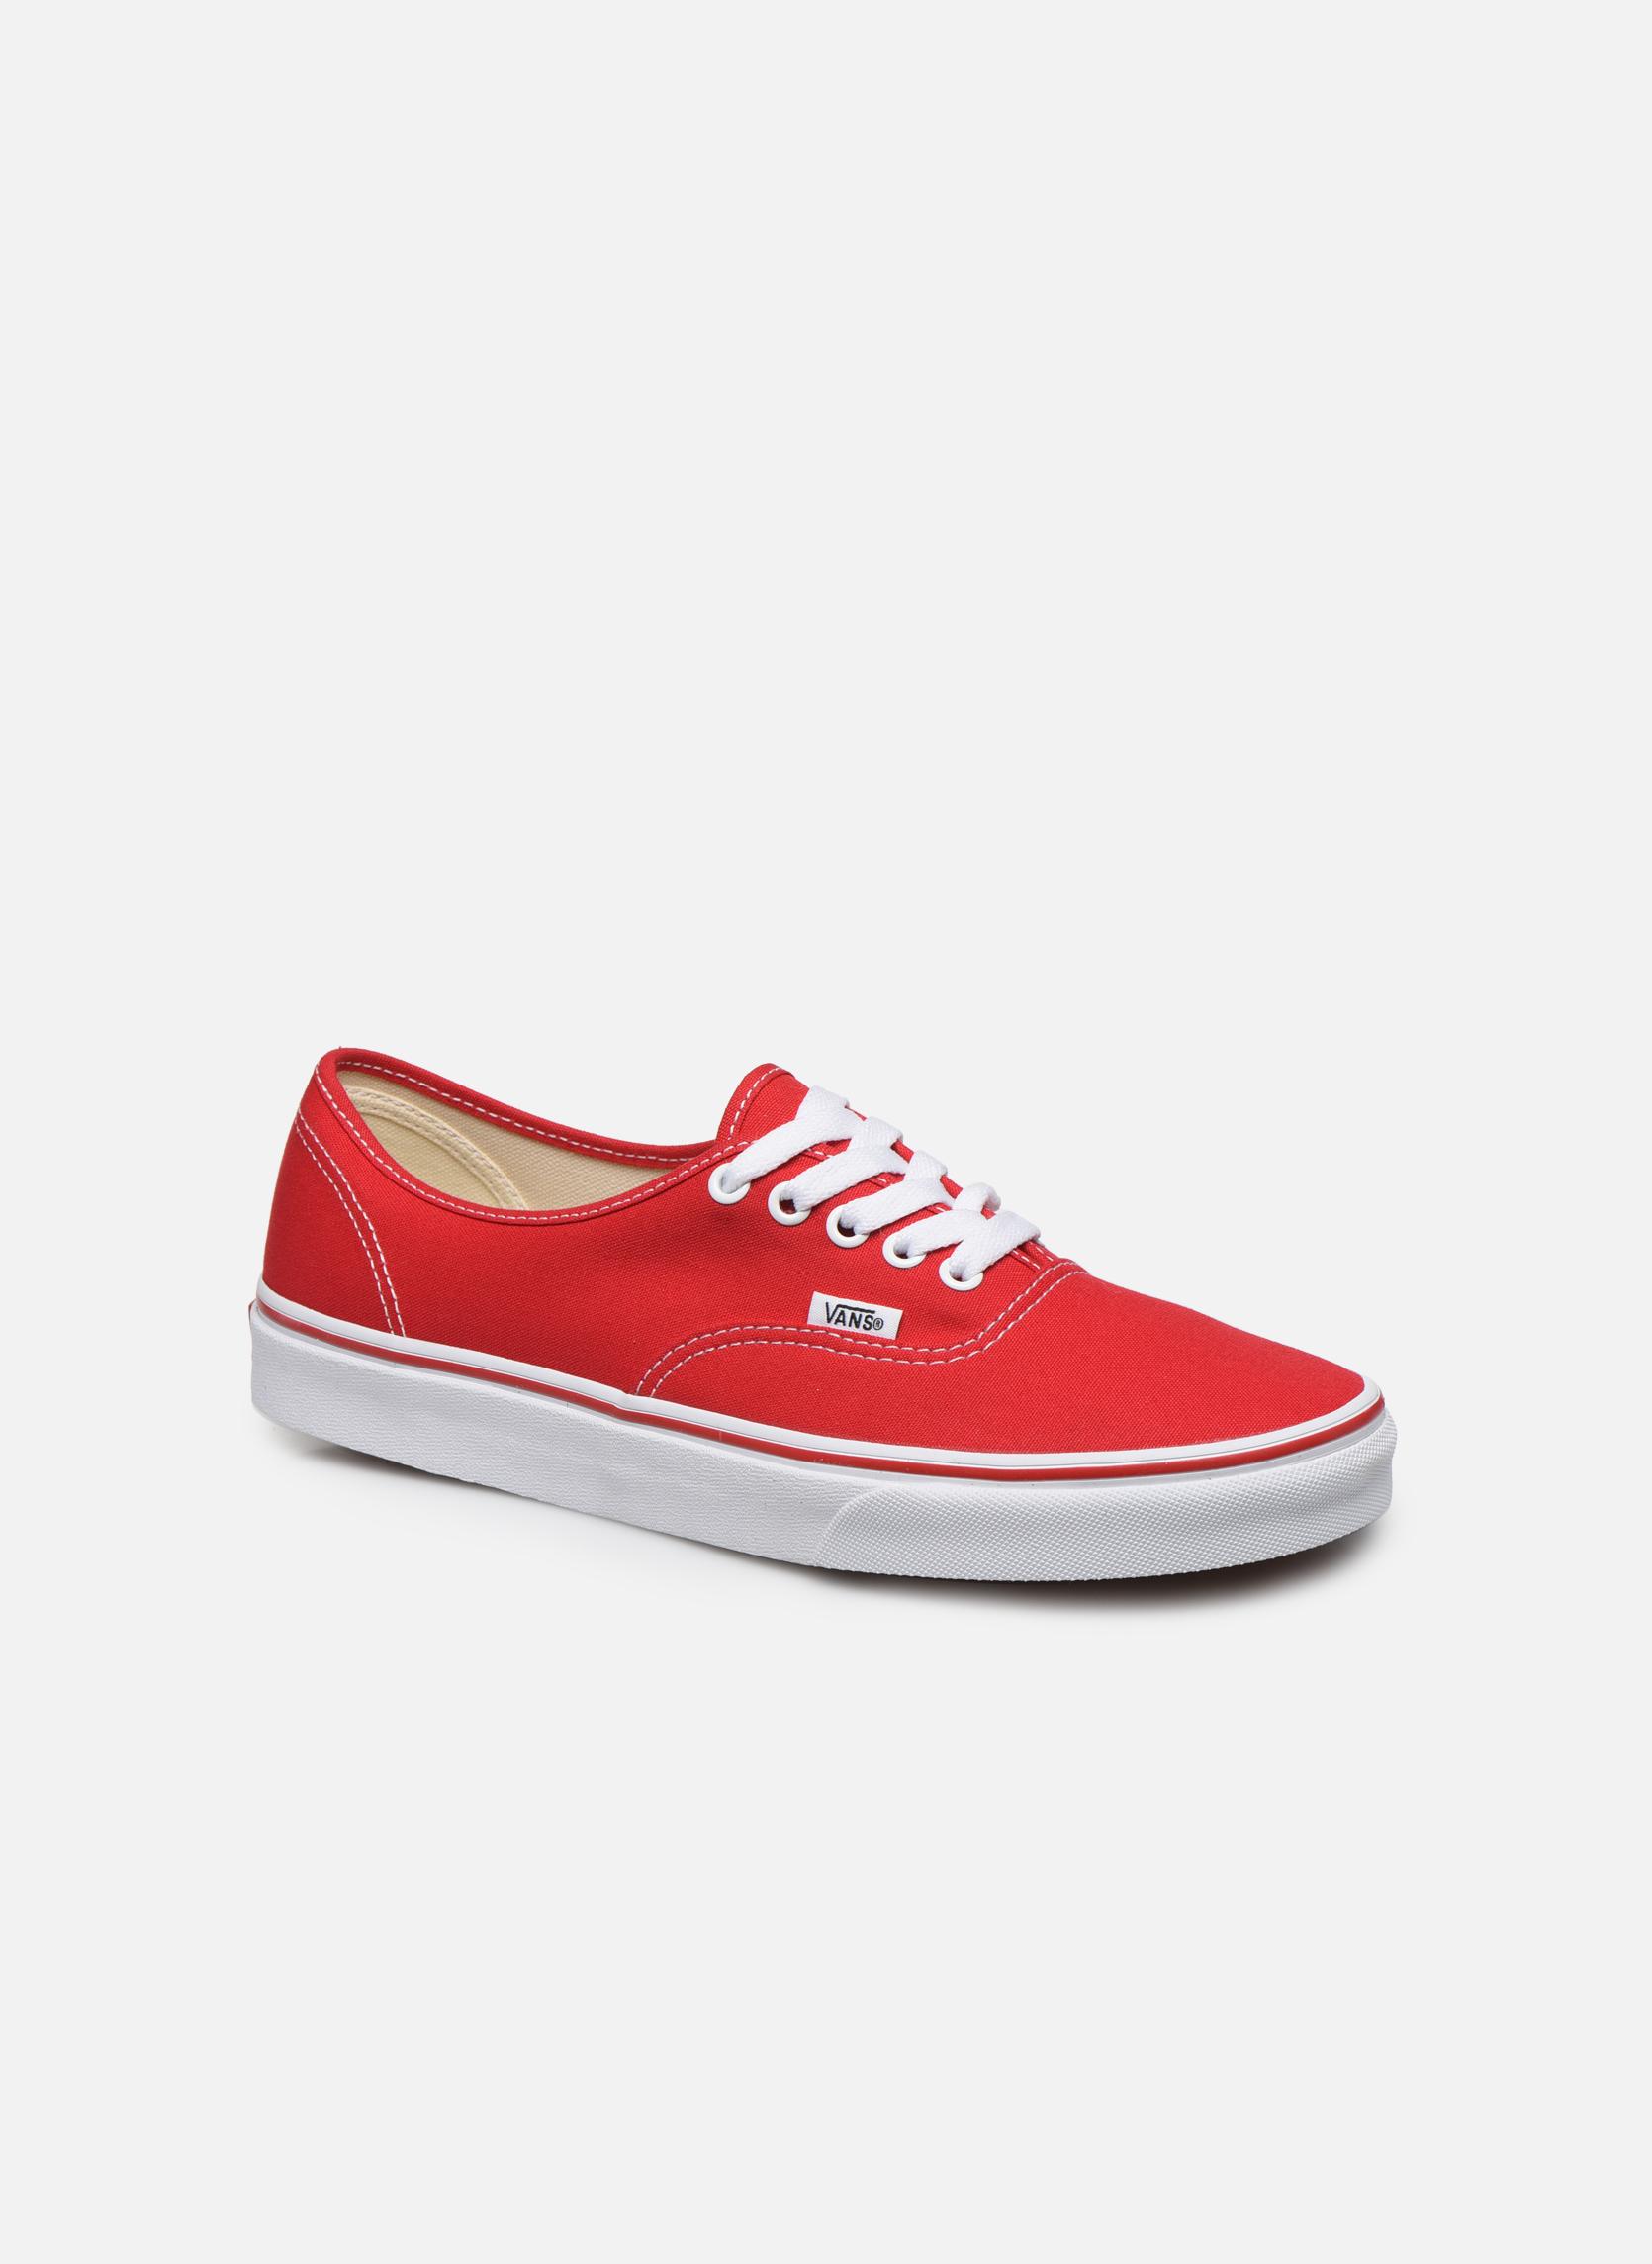 Sneakers Vans Authentic Röd detaljerad bild på paret